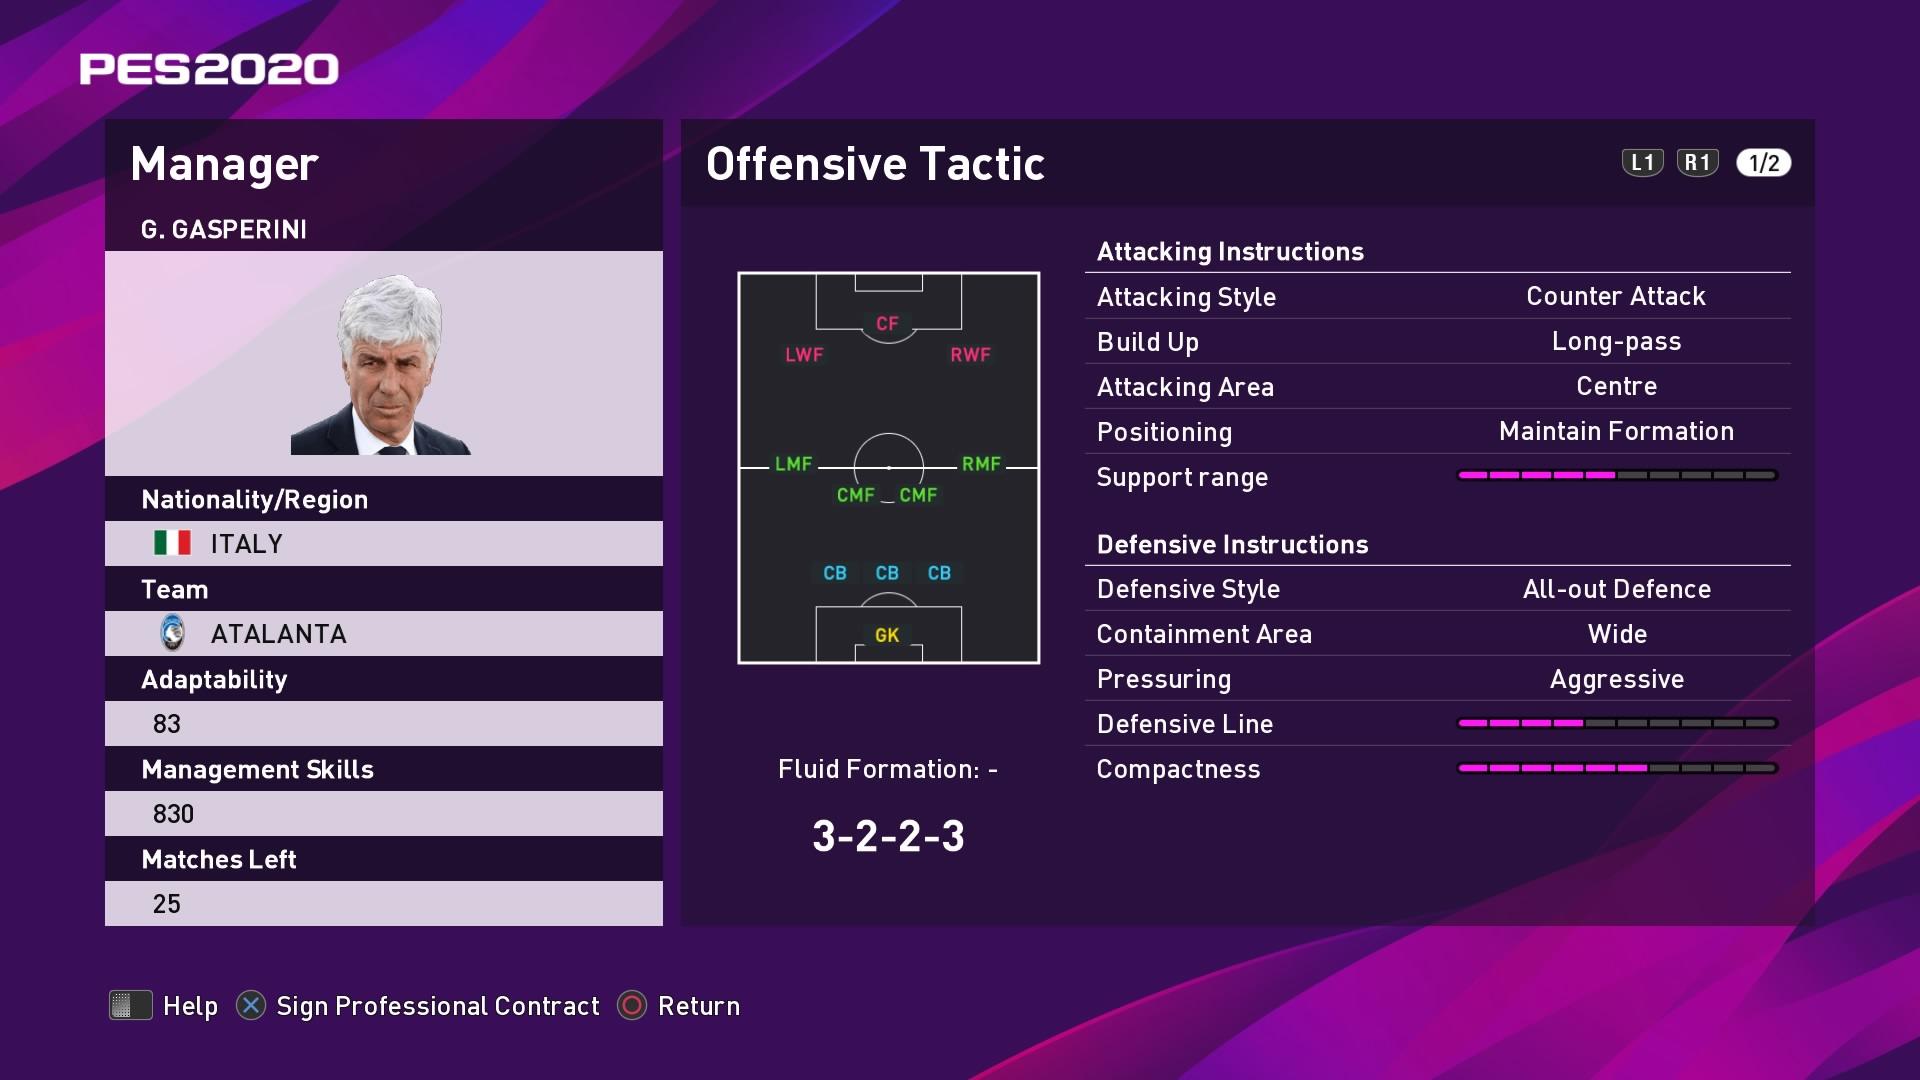 G. Gasperini (2) (Gian Piero Gasperini) Offensive Tactic in PES 2020 myClub